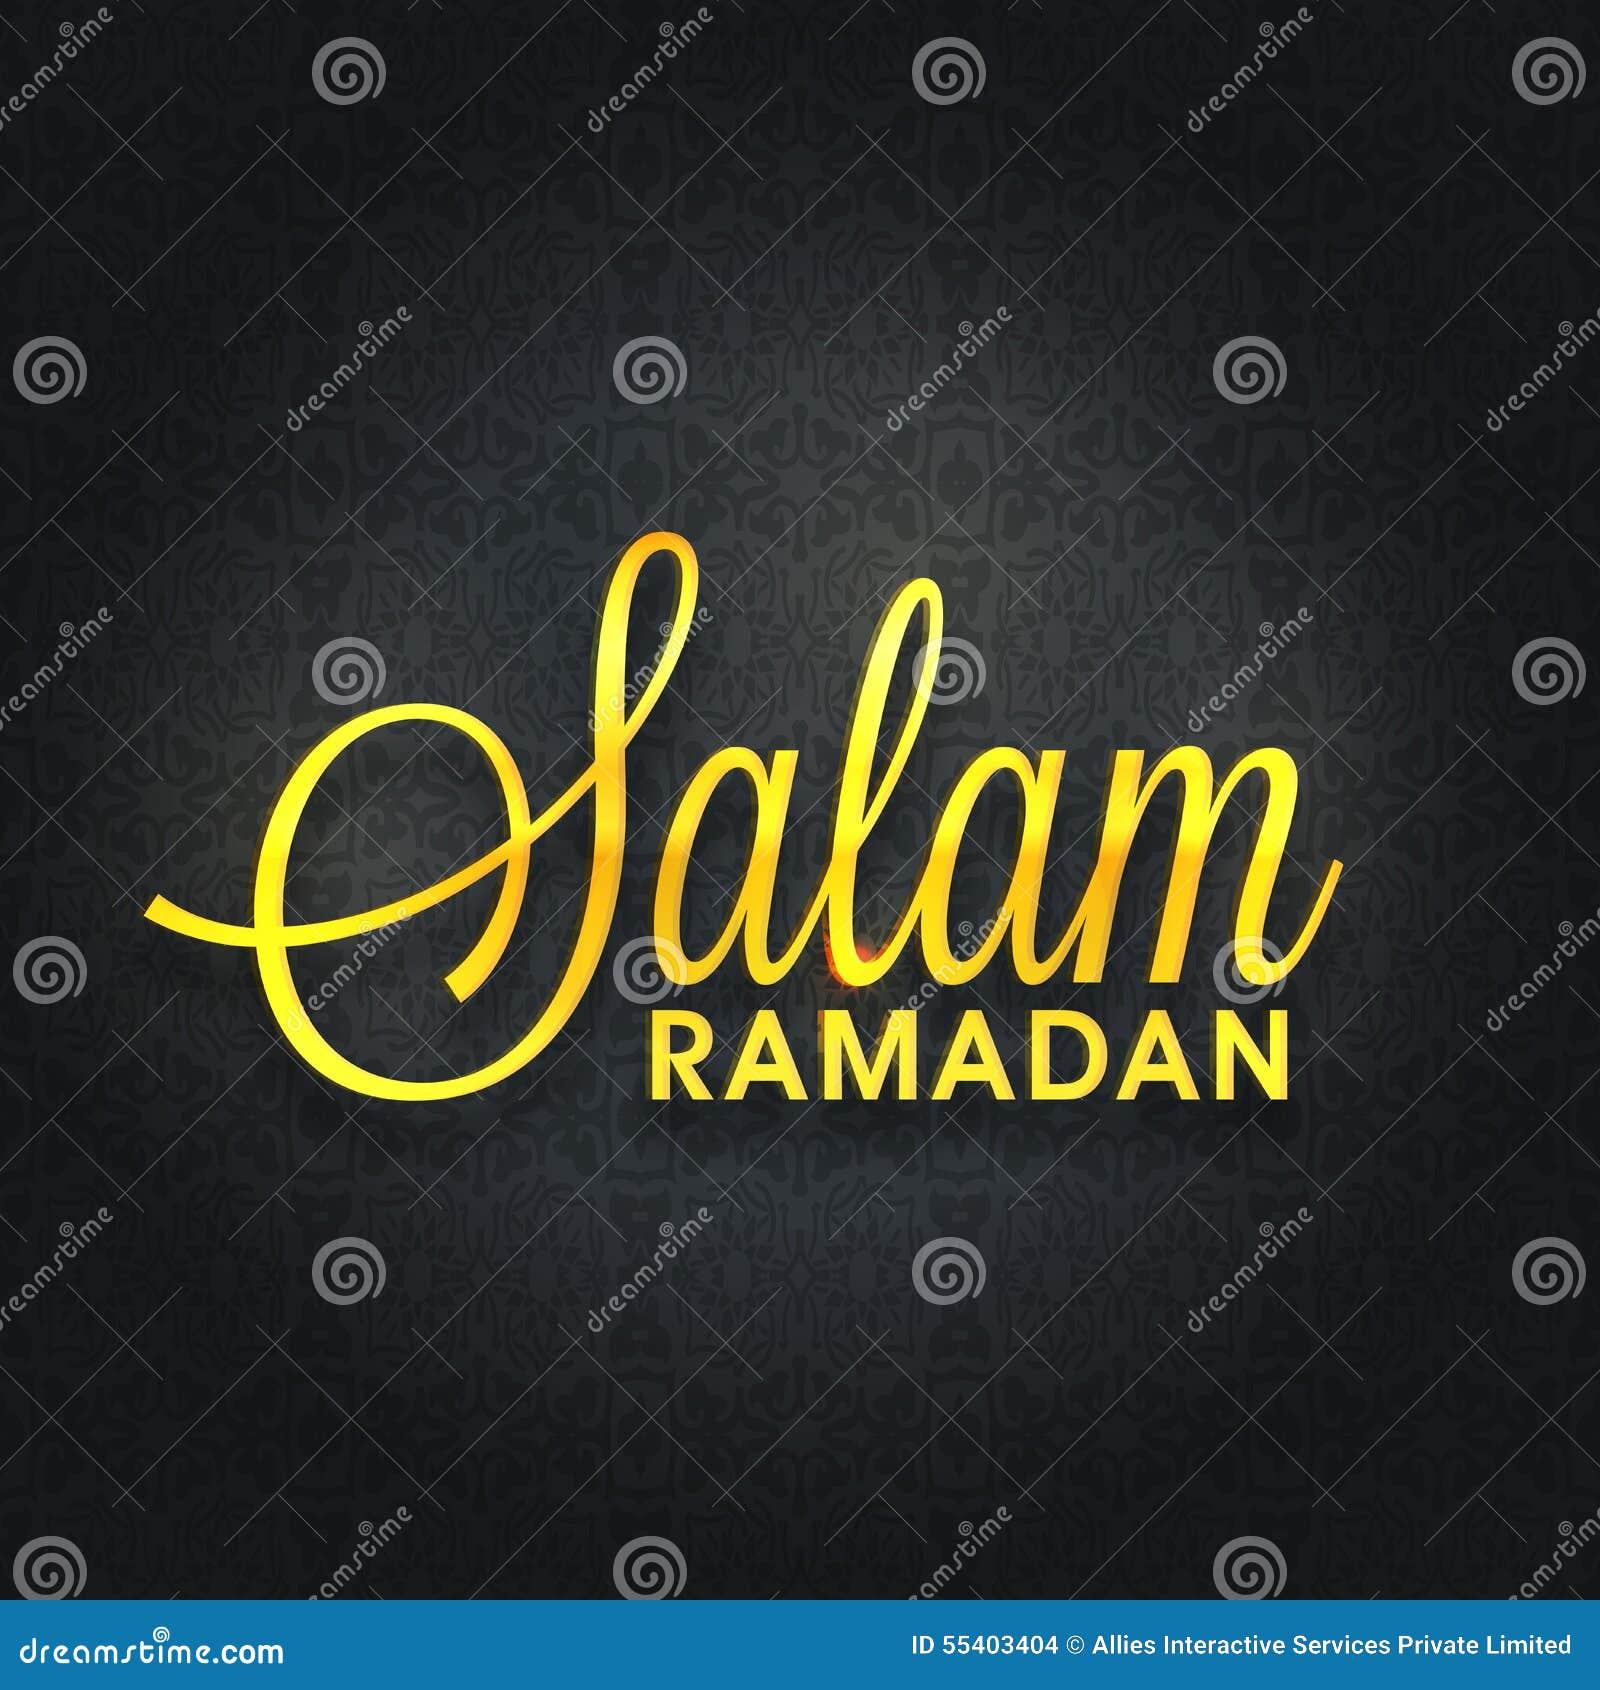 Greeting Card With Stylish Text For Ramadan Kareem Stock